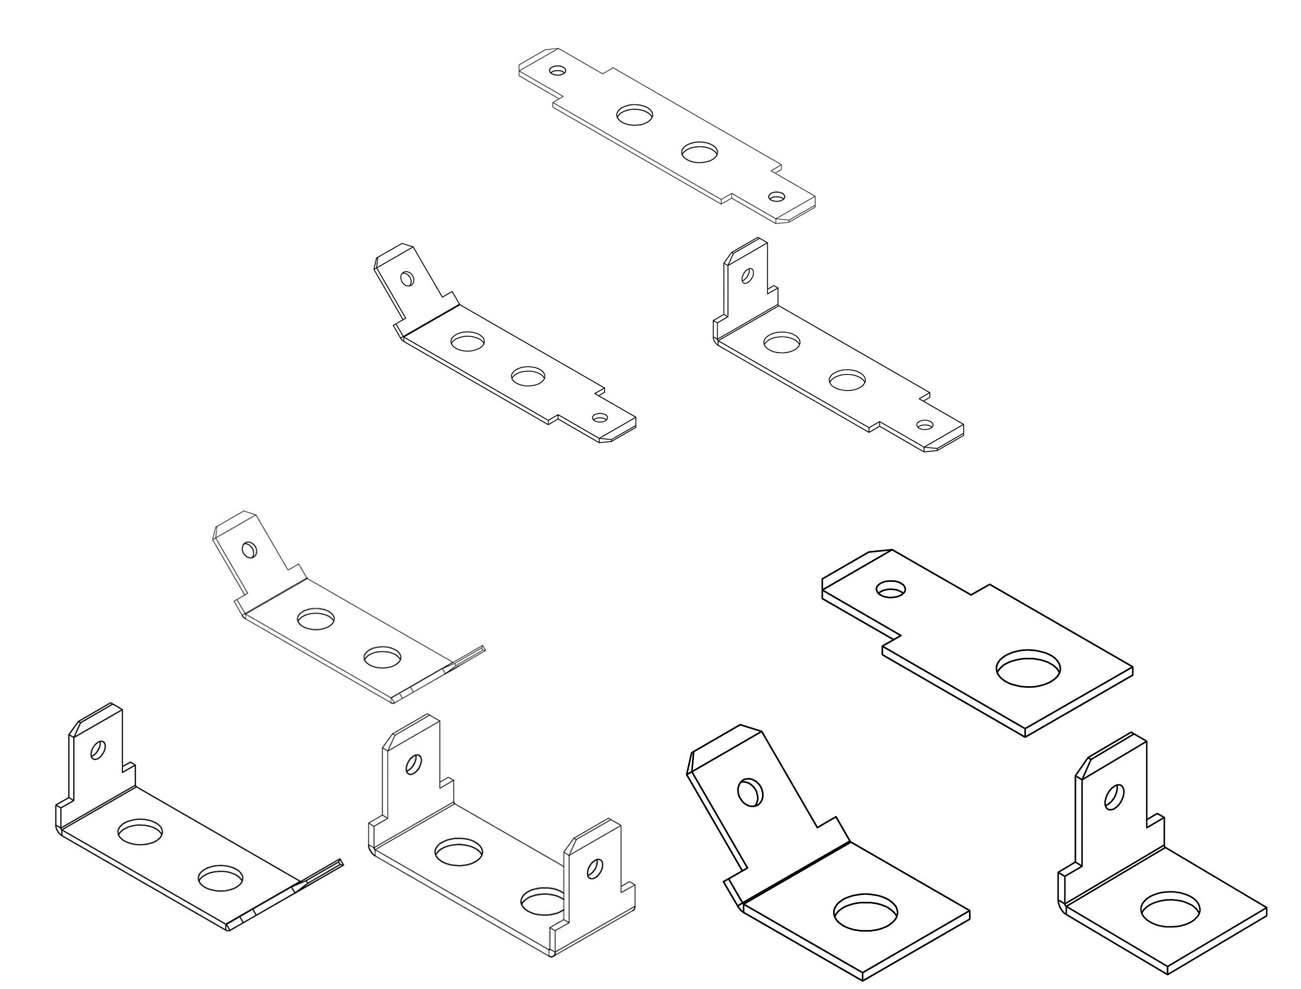 端子台快插 - SHINING-Terminal Blocks Quick Connector